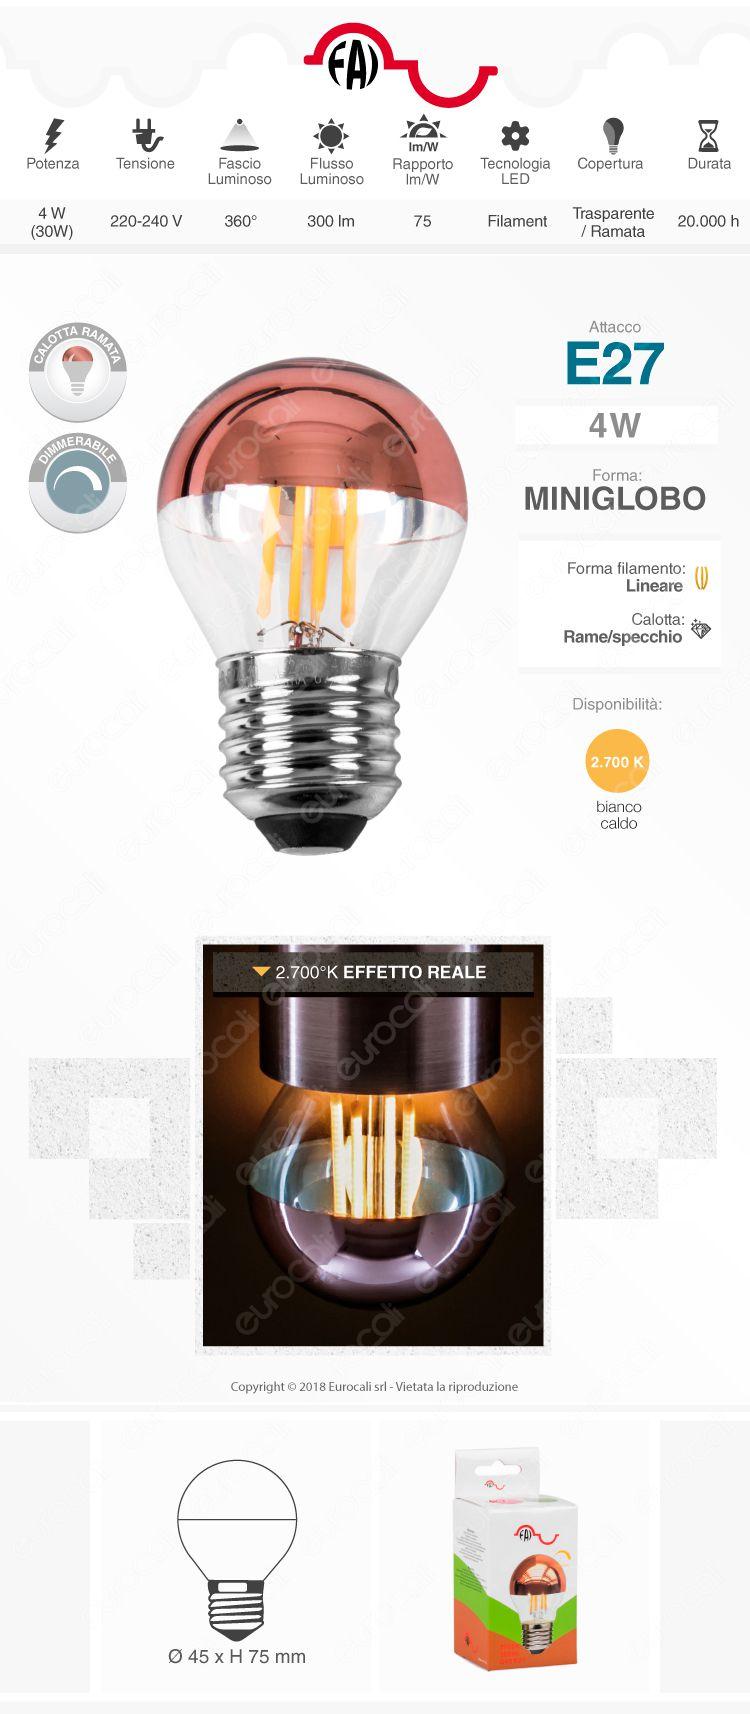 FAI Lampadina E27 Filamenti LED 4W MiniGlobo G45 con Calotta Ramata Dimmerabile - mod. 5260/CA/RAM